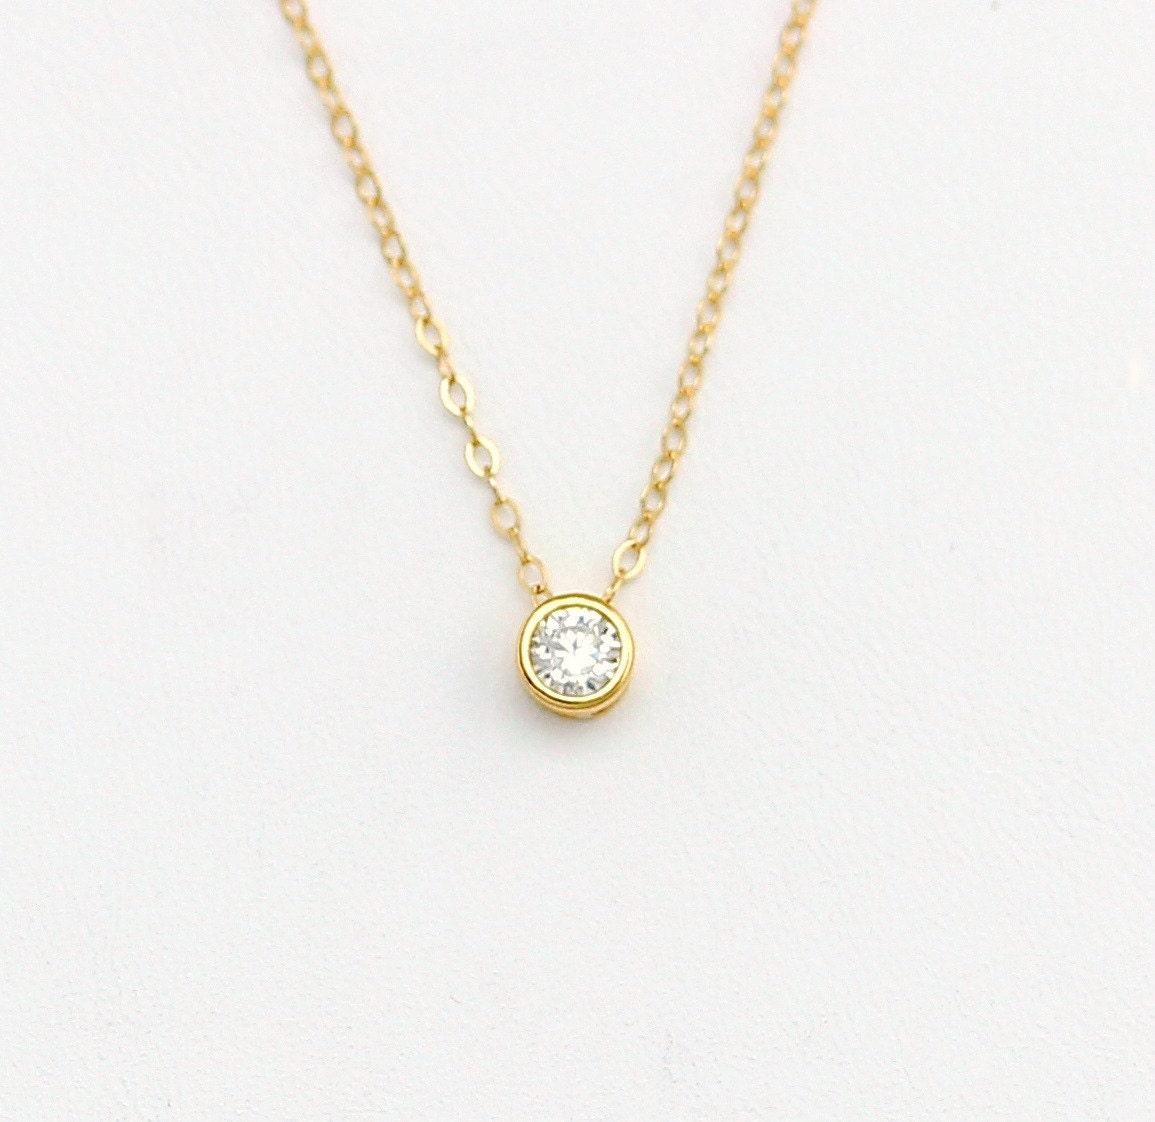 dainty tiny cubic zirconia necklace cz diamond necklace. Black Bedroom Furniture Sets. Home Design Ideas